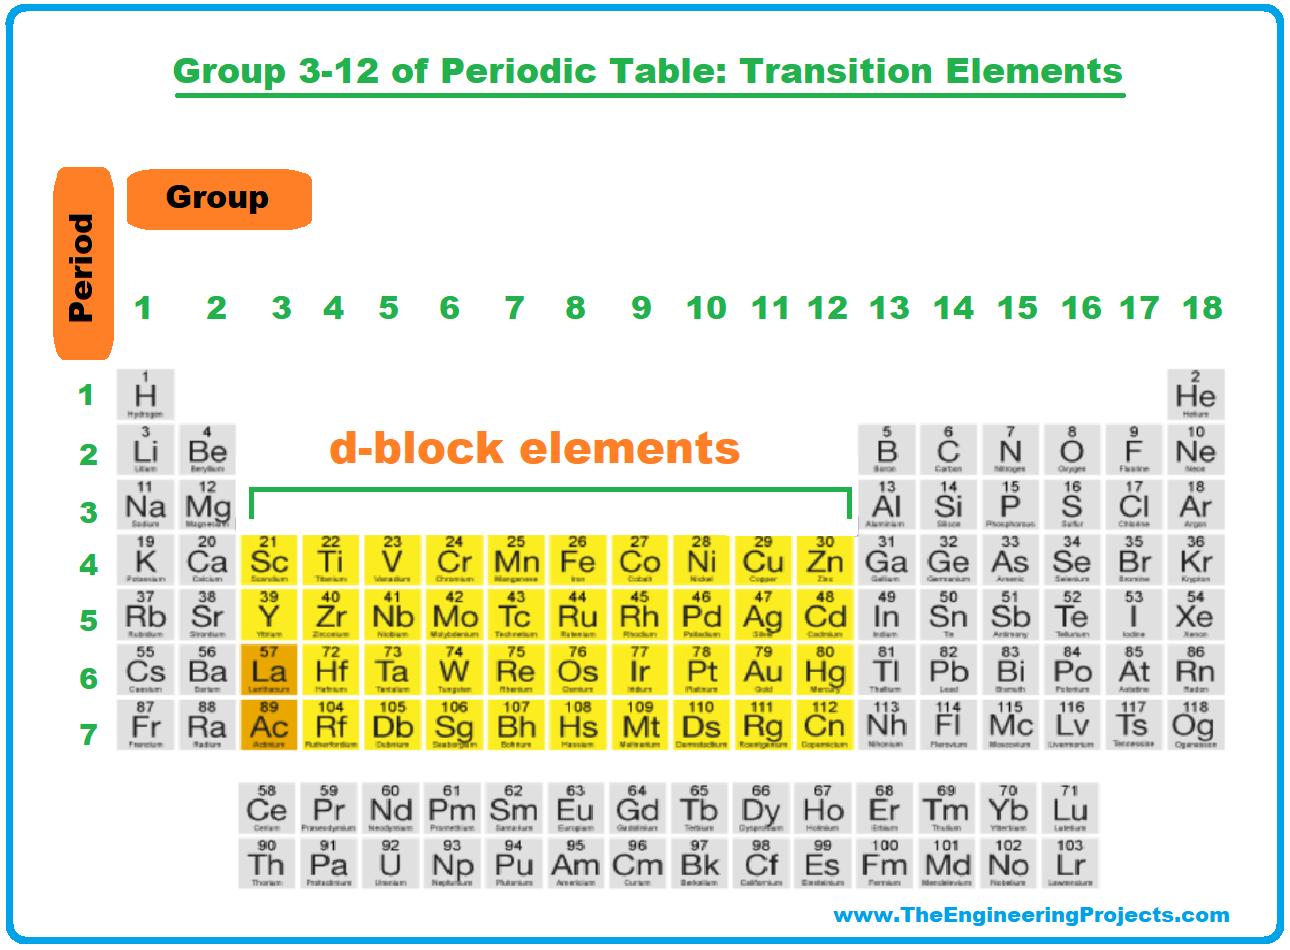 History of Periodic Table, Periodic Table, periodic table deifnition, periodic table group3 to 12, group3 to 12 of periodic table, transition elements, periodic table trends, alkaline earth metals, alkaline earth metals in periodic table